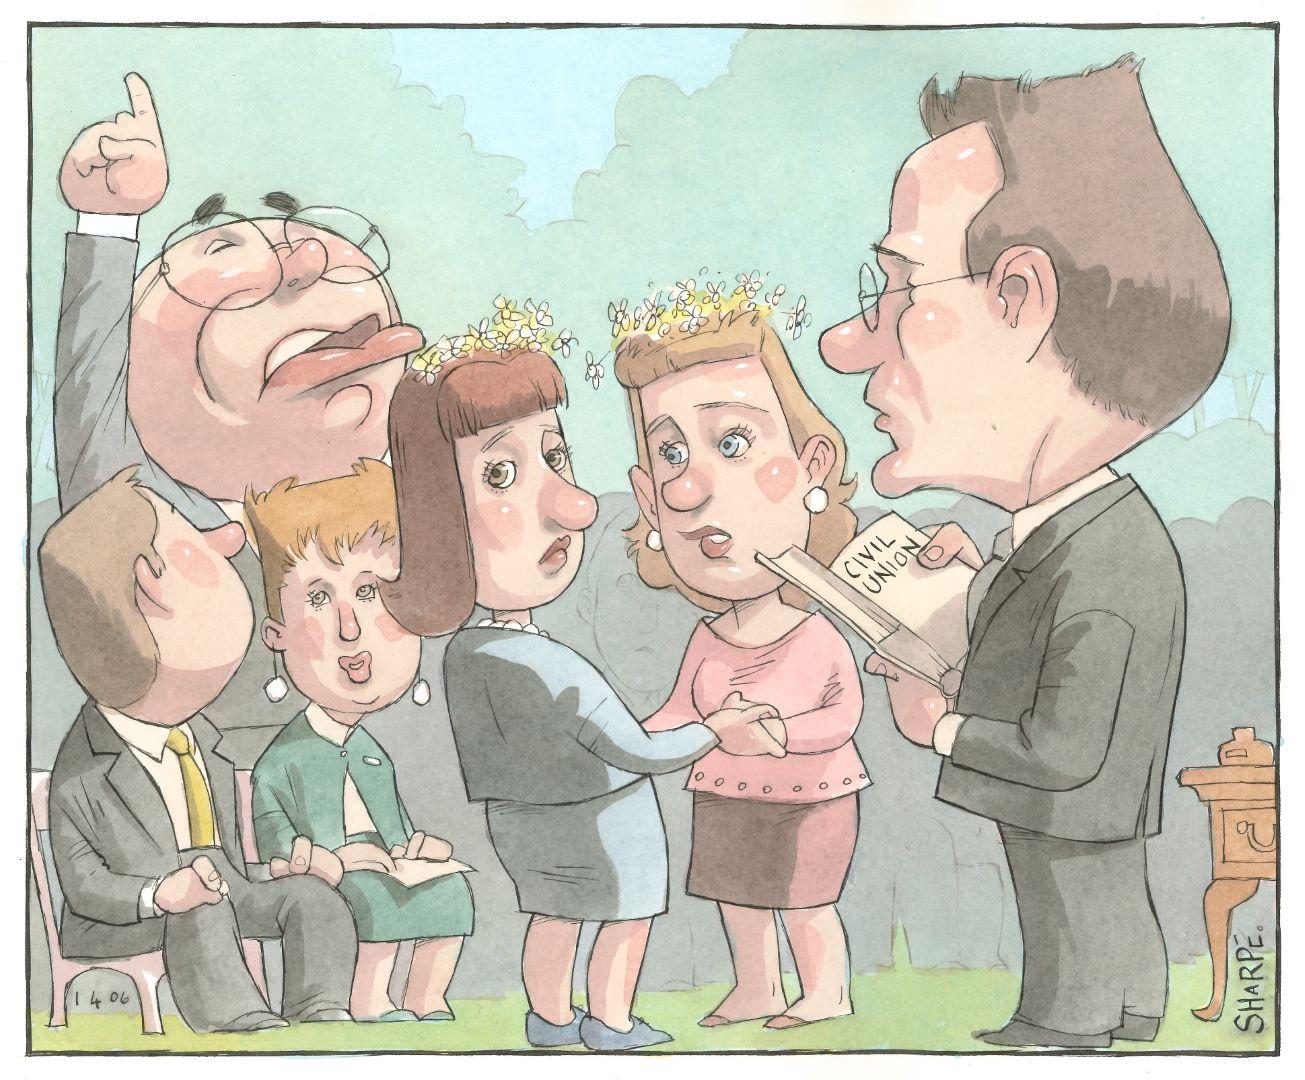 [Prime Minister John Howard quashes ACT Civil Union Bill] - Ian Sharpe, 1 April 2006, Papers of Nick Henderson